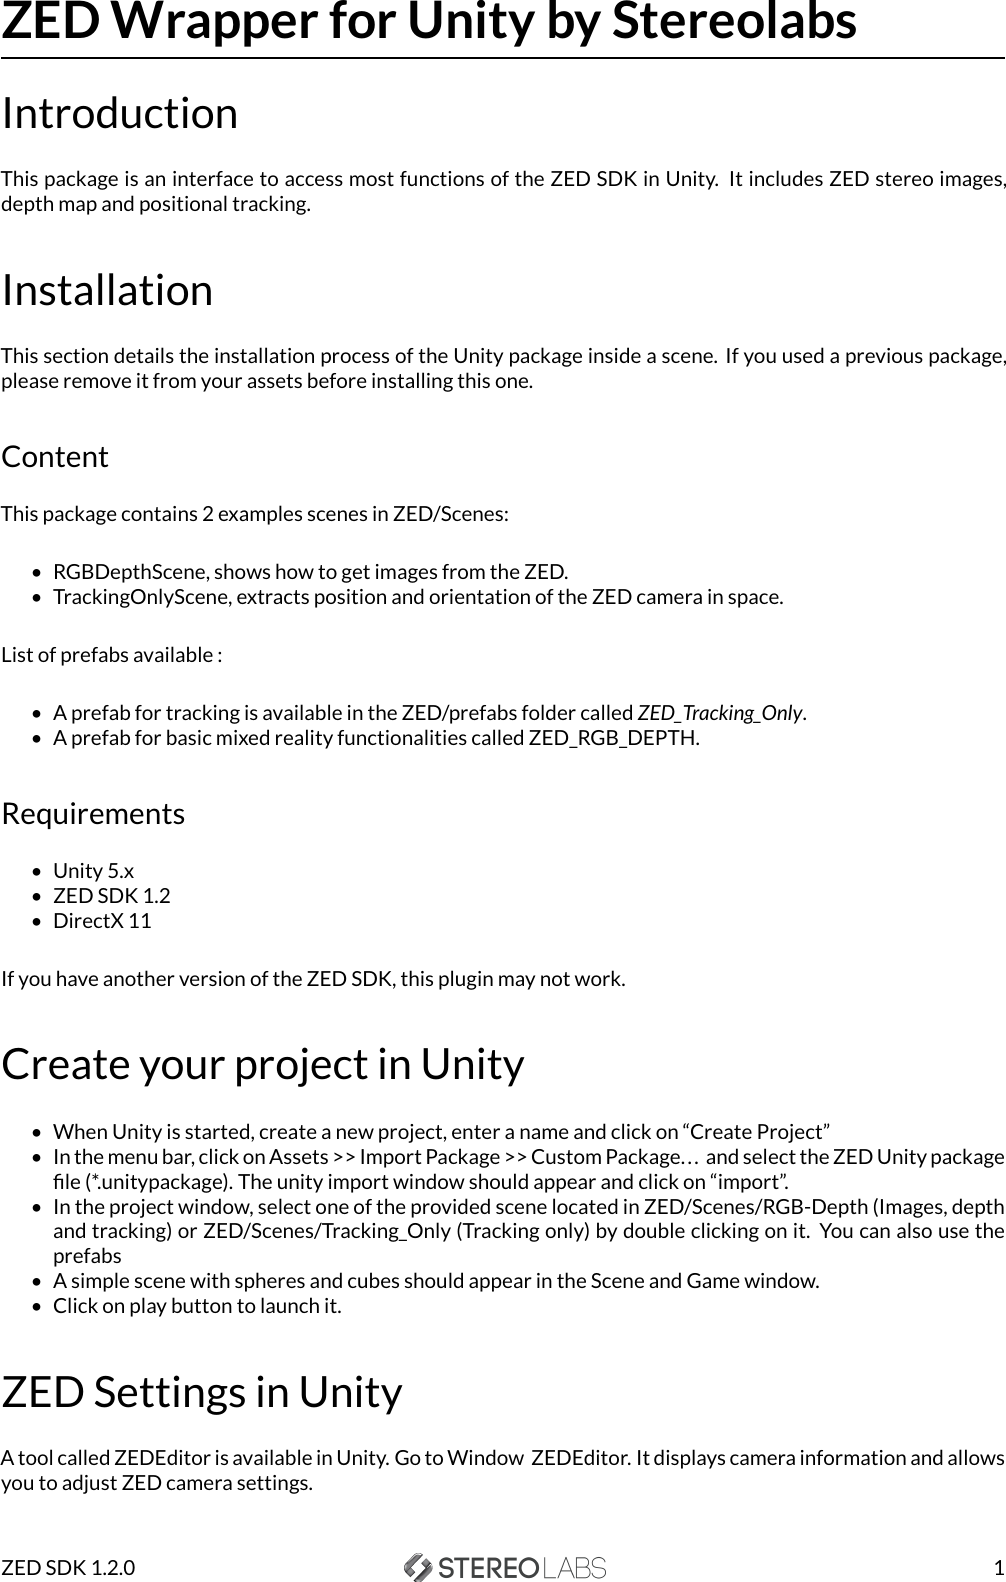 ZED Unity User Guide